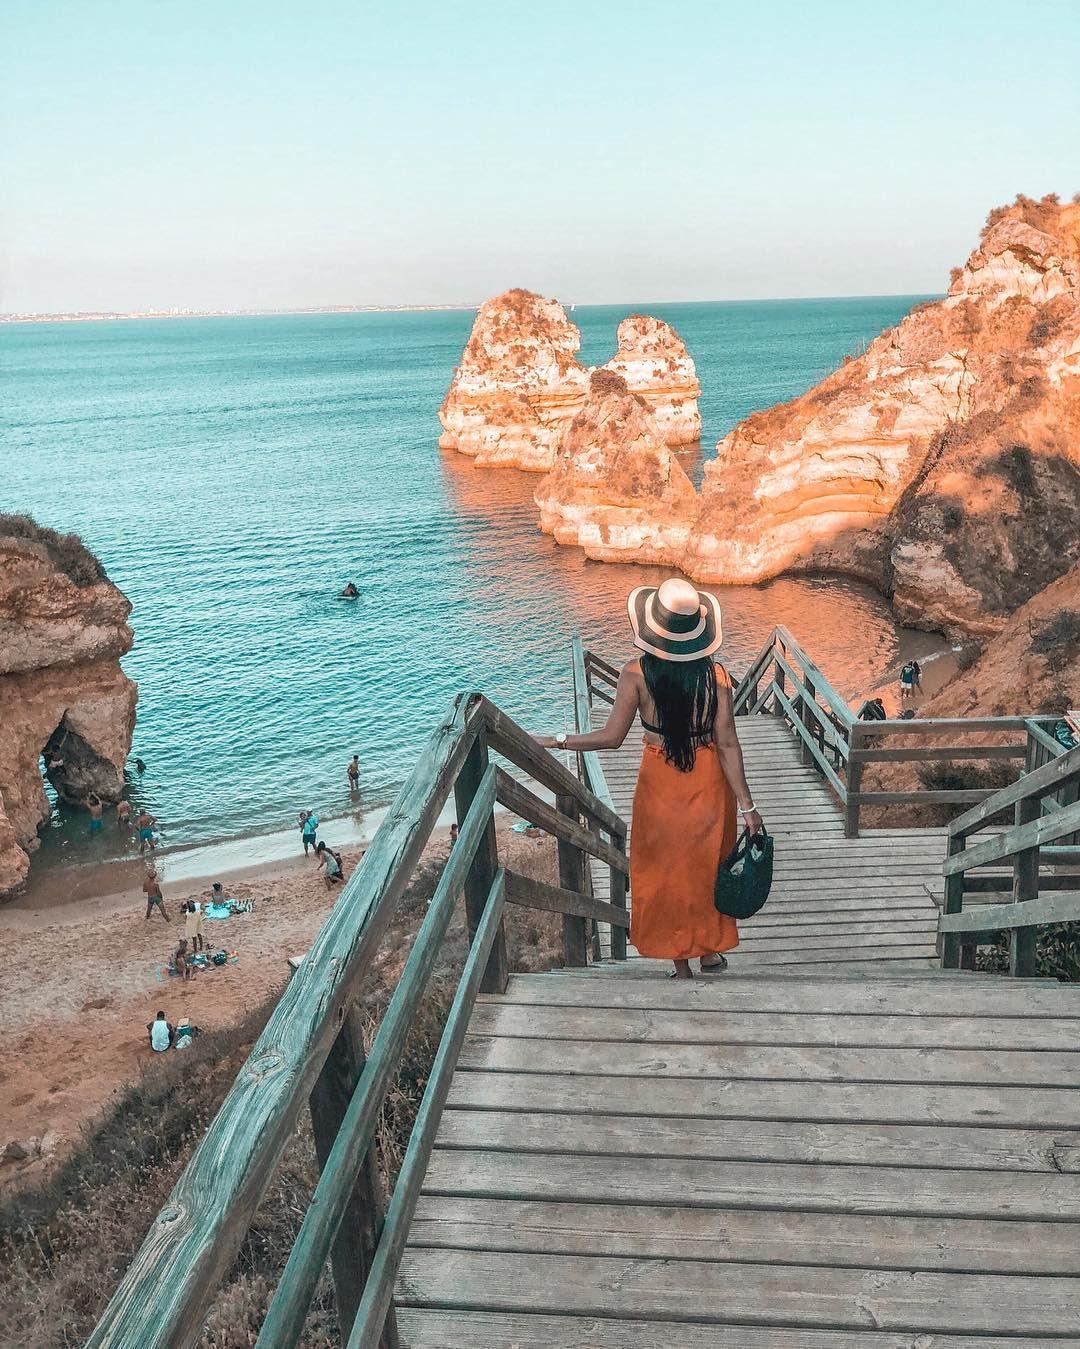 Beautiful Places To See In Lagos At The Algarve In Portugal Schone Orte Die Man In Lagos An Der Fotografia De Cidades Arraial Do Cabo Fotos Roupas De Portugal